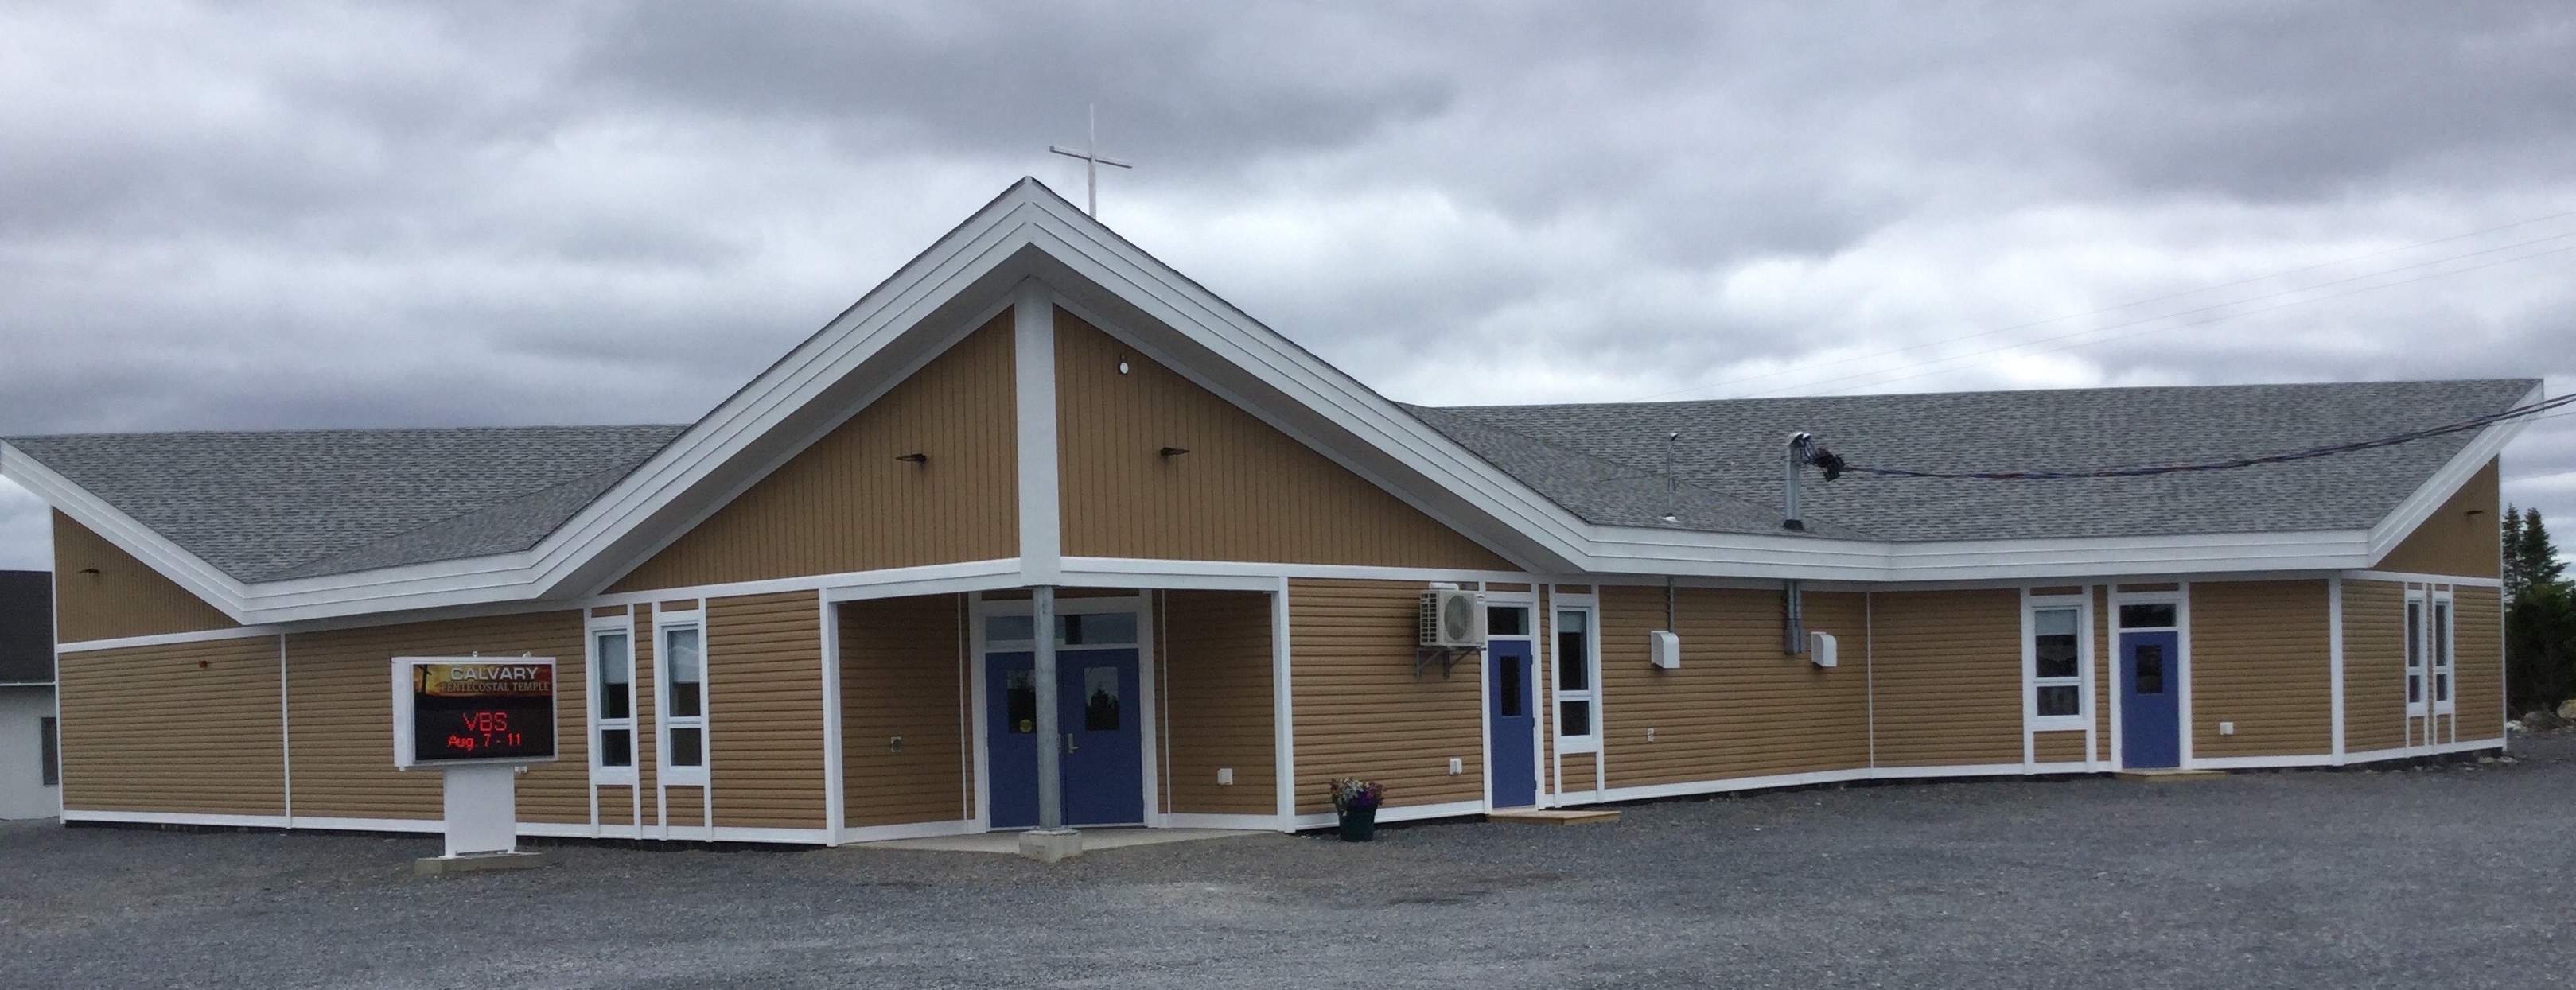 Calvary Pentecostal Temple, Roddick